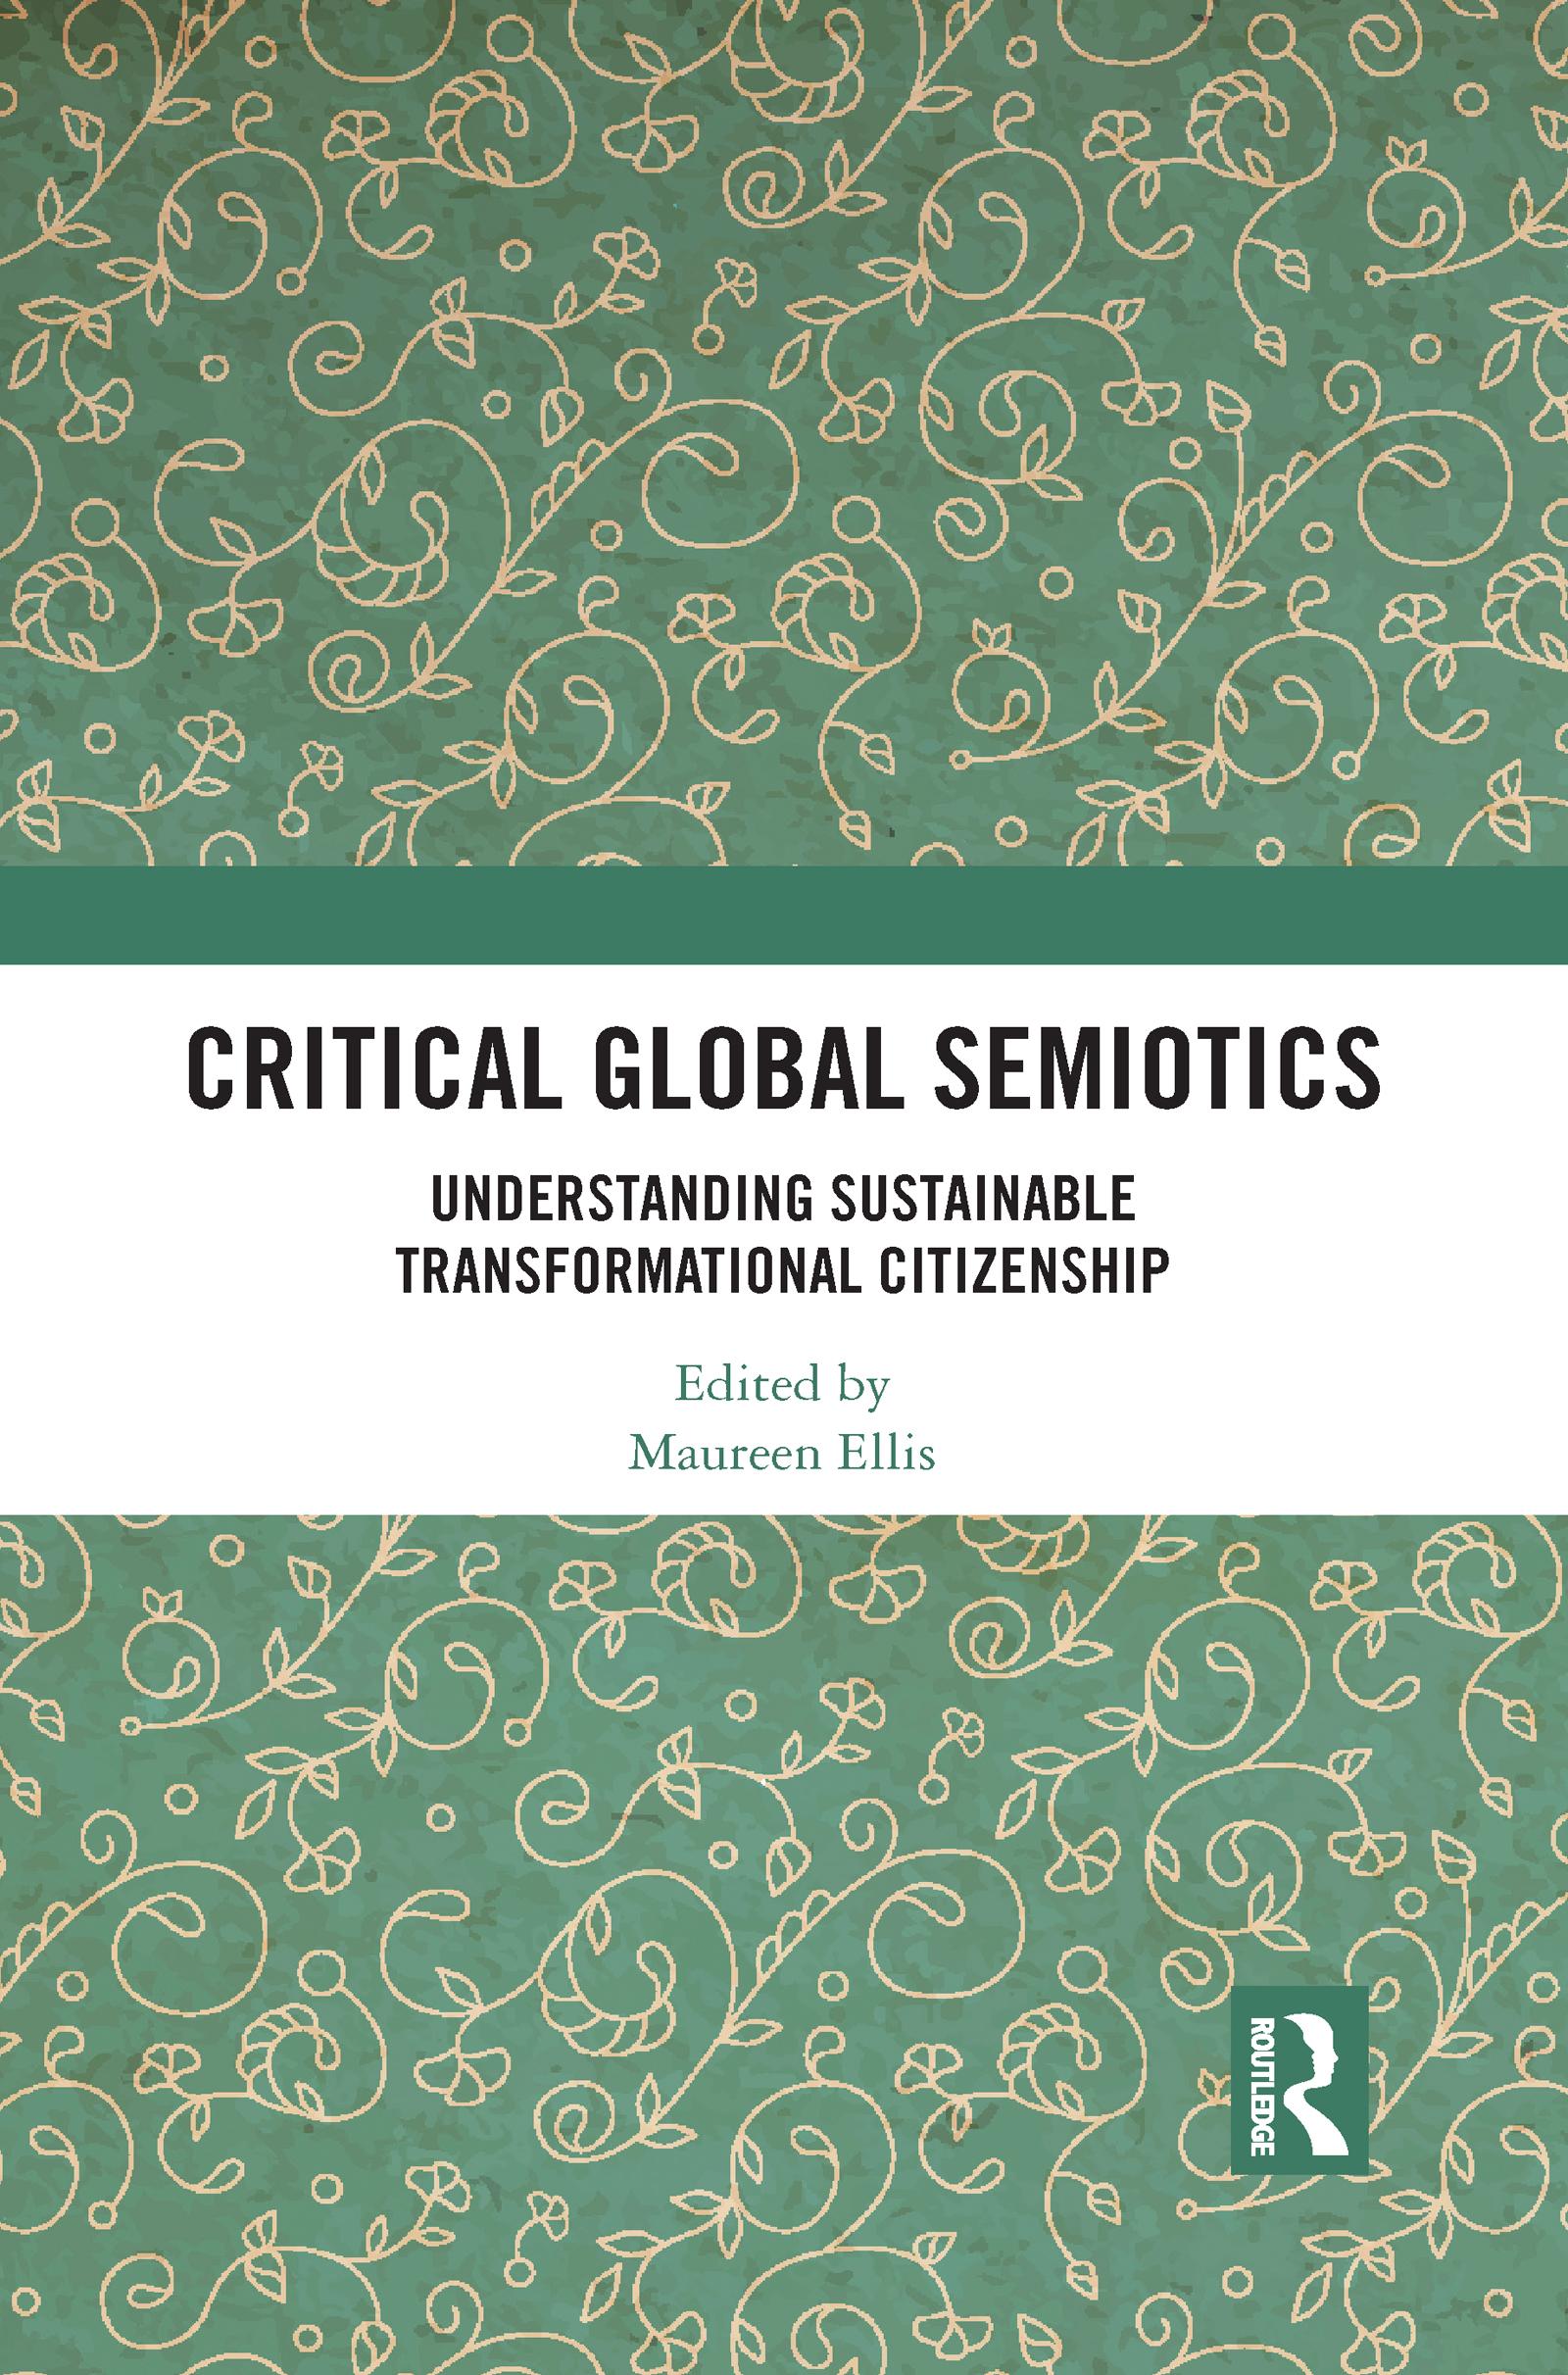 Critical Global Semiotics